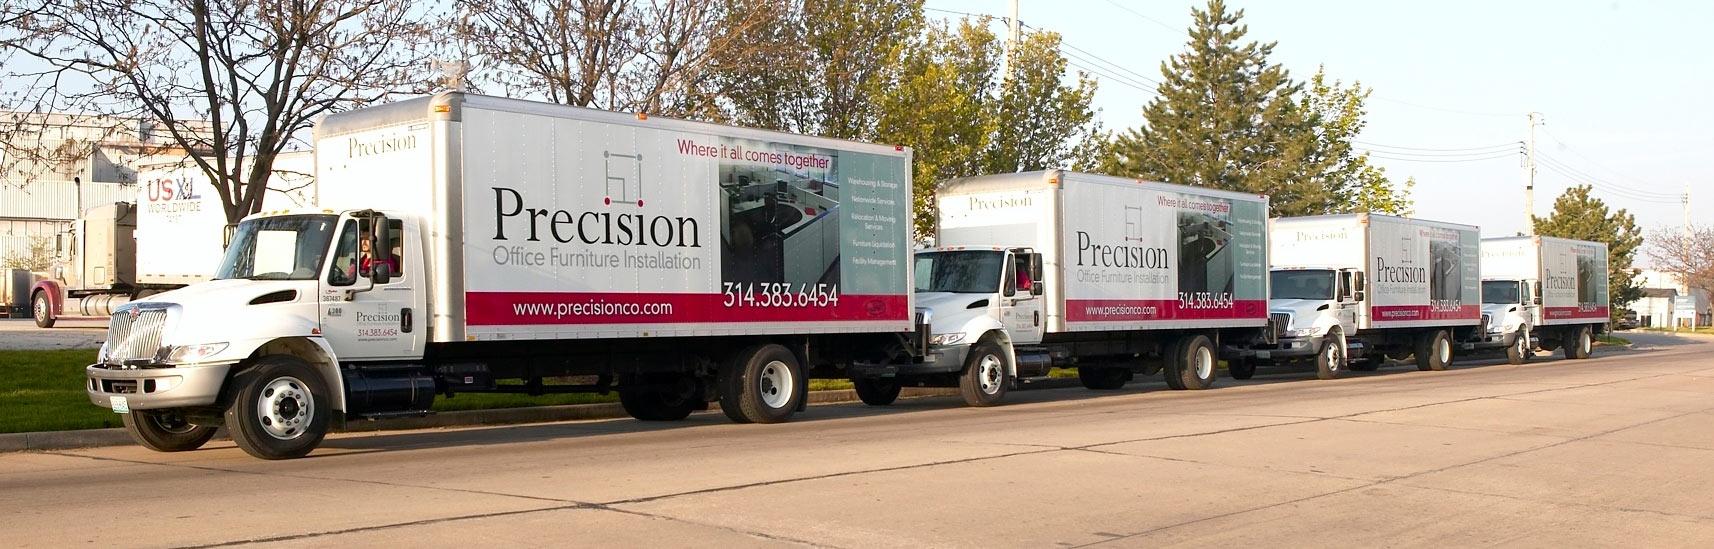 office furniture trucks